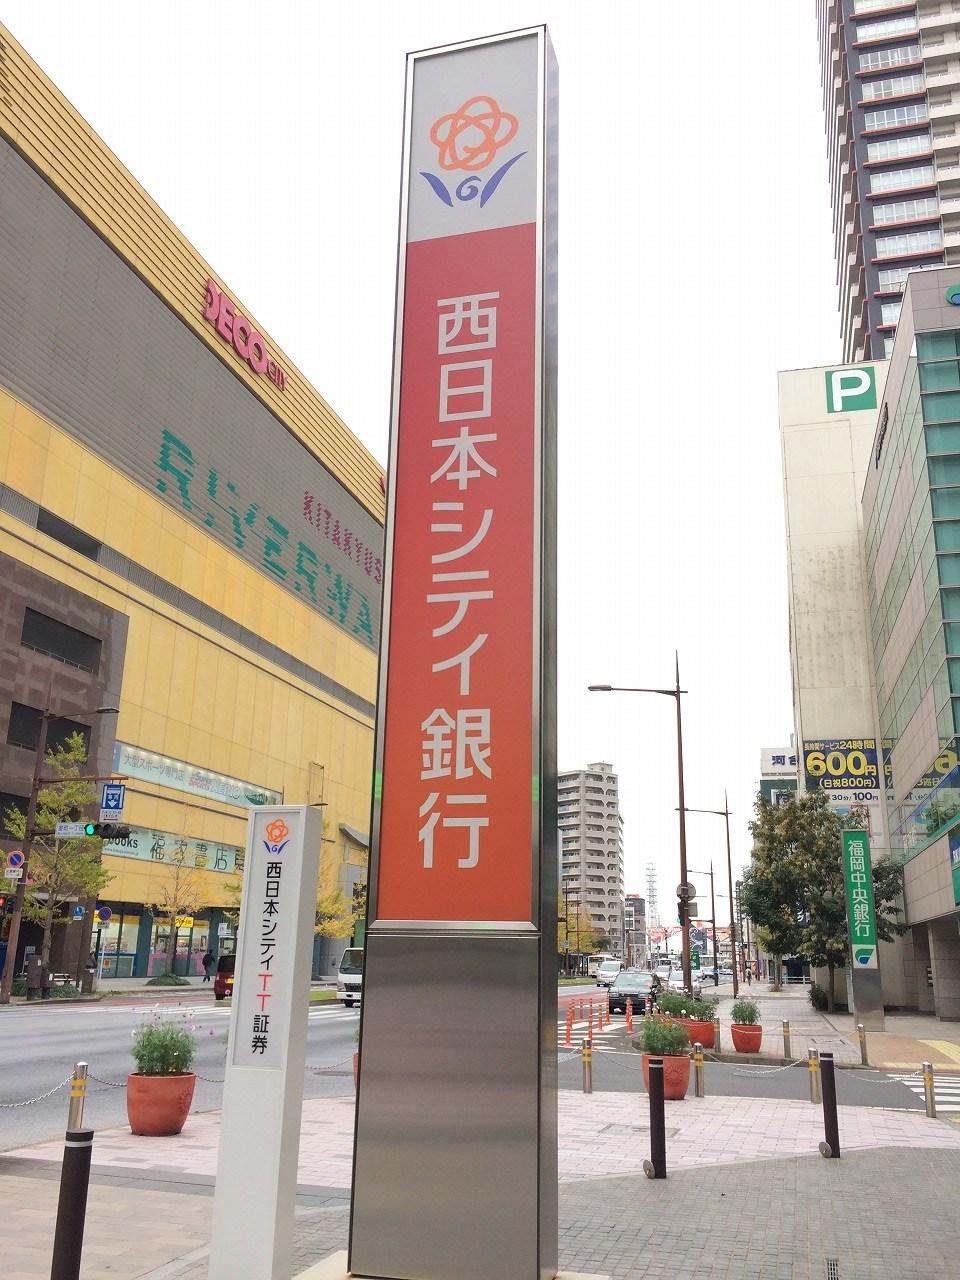 銀行:西日本シティ銀行 JR朽網駅 560m